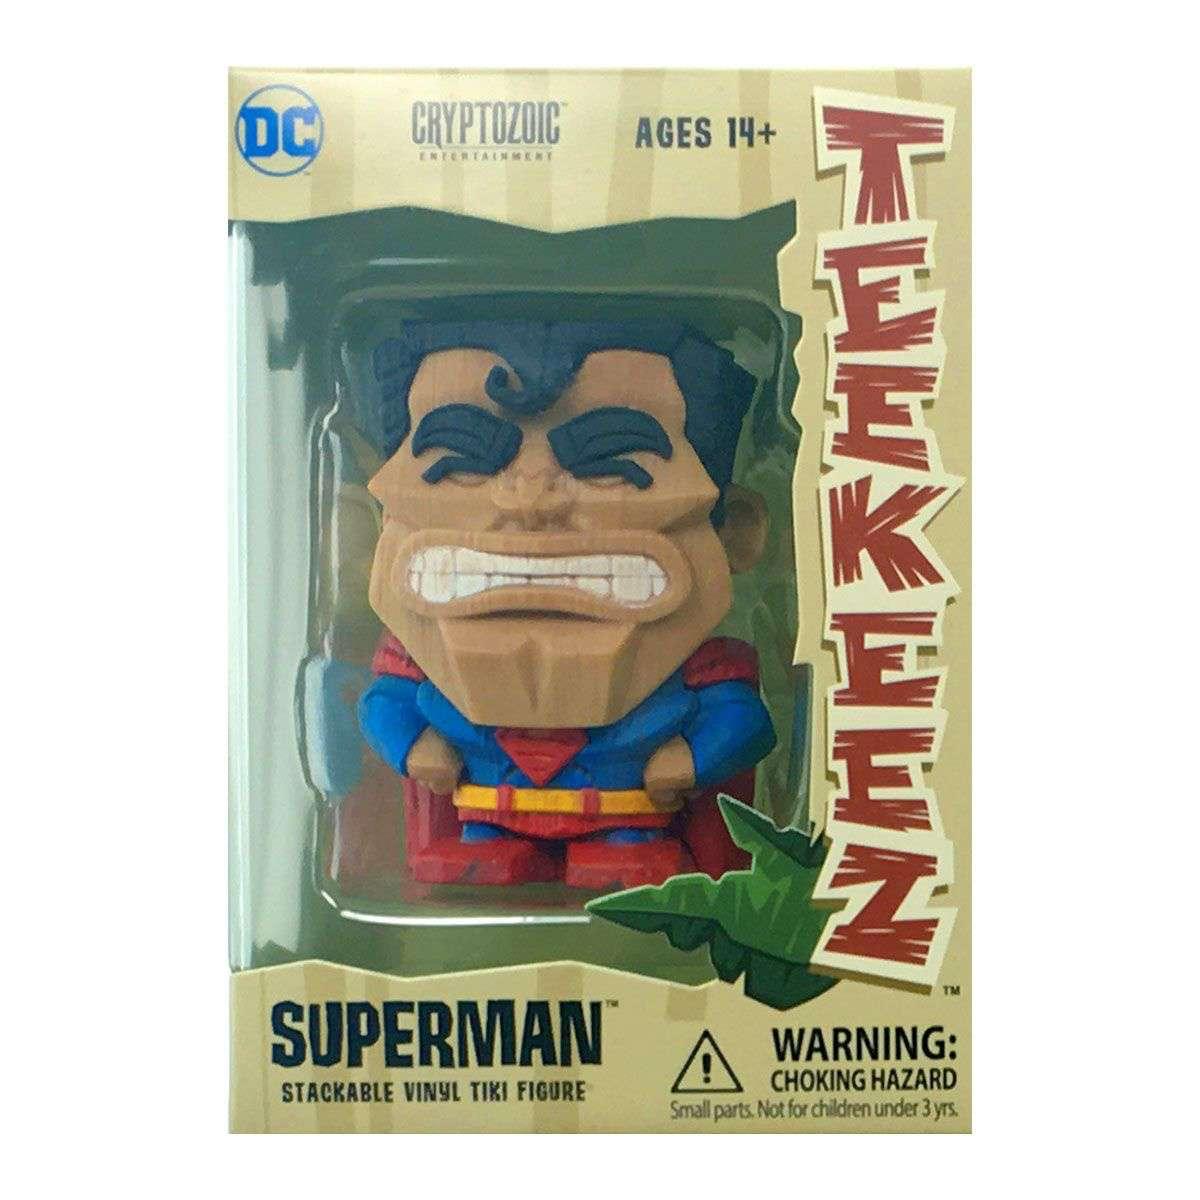 SUPERMAN TEEKEEZ DC COMICS - CRYPTOZOIC